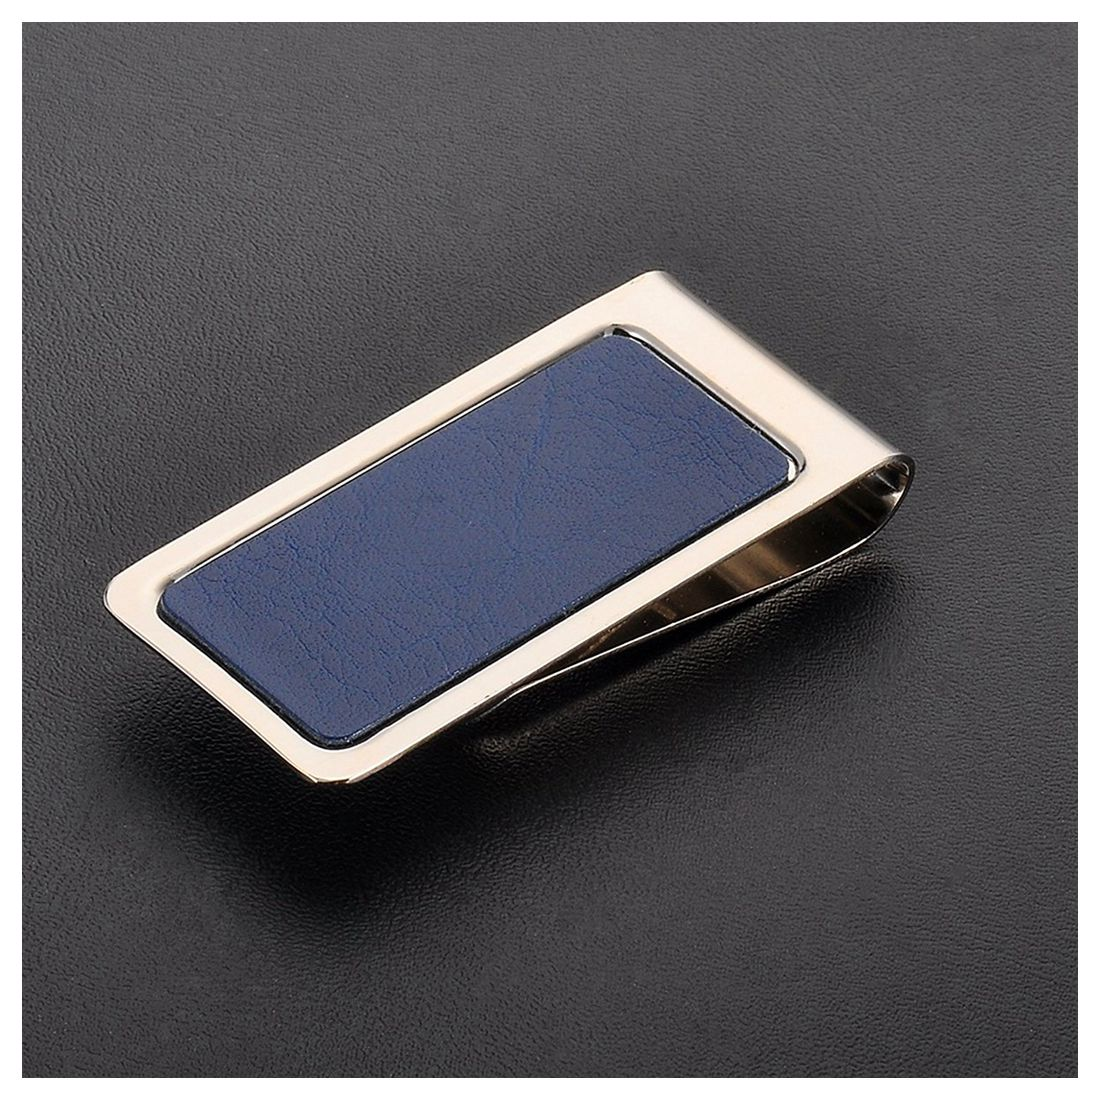 Mens Stainless Steel Pocket Cash Money Clip Credit Card Wallet Holder Hollow Design(blue+Silver)